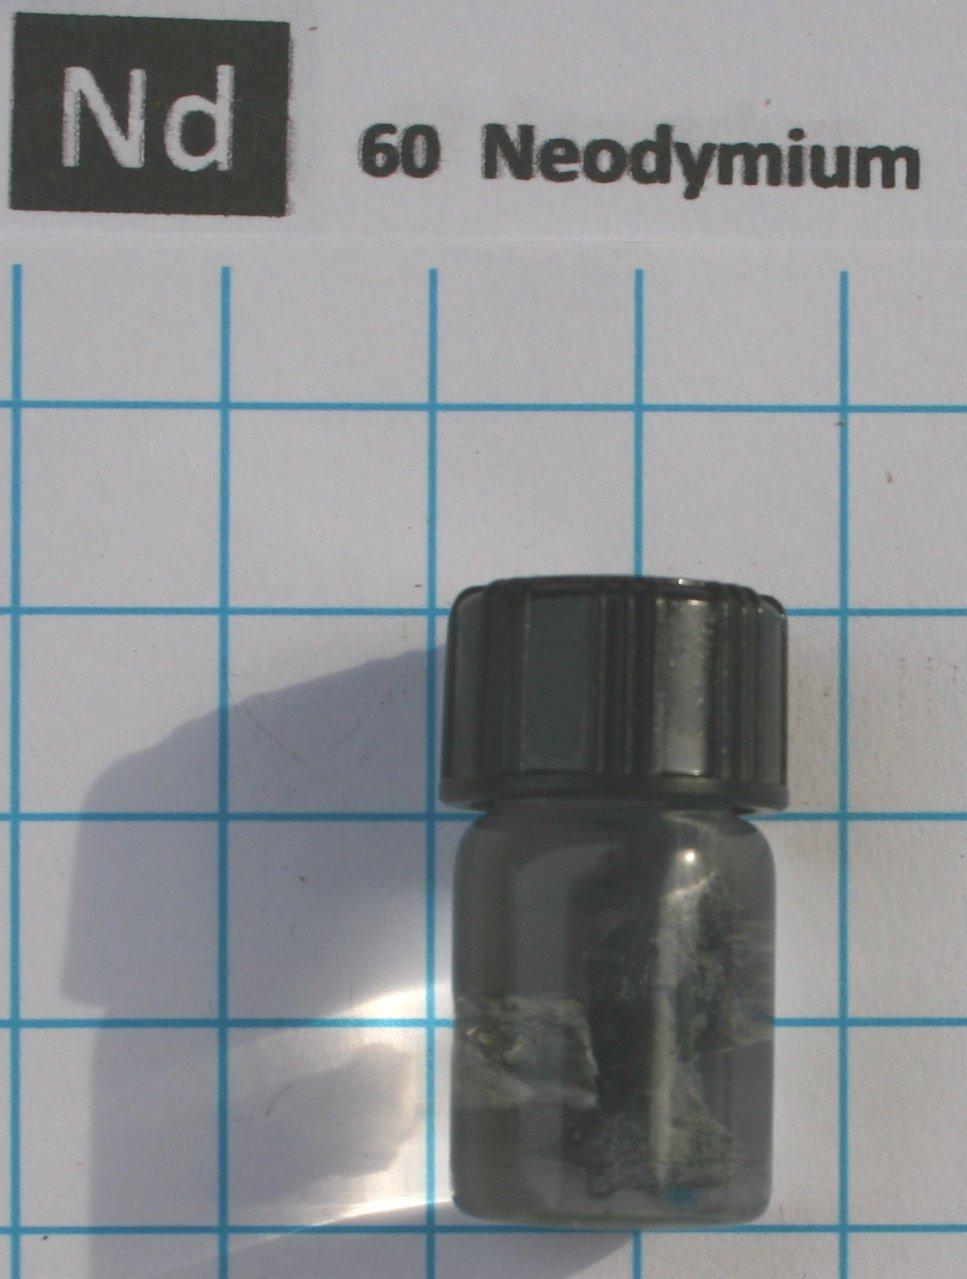 1 Gram 99.3% Neodymium Metal Pieces Under Mineral Oil In Glass Vial Element 60 Sample